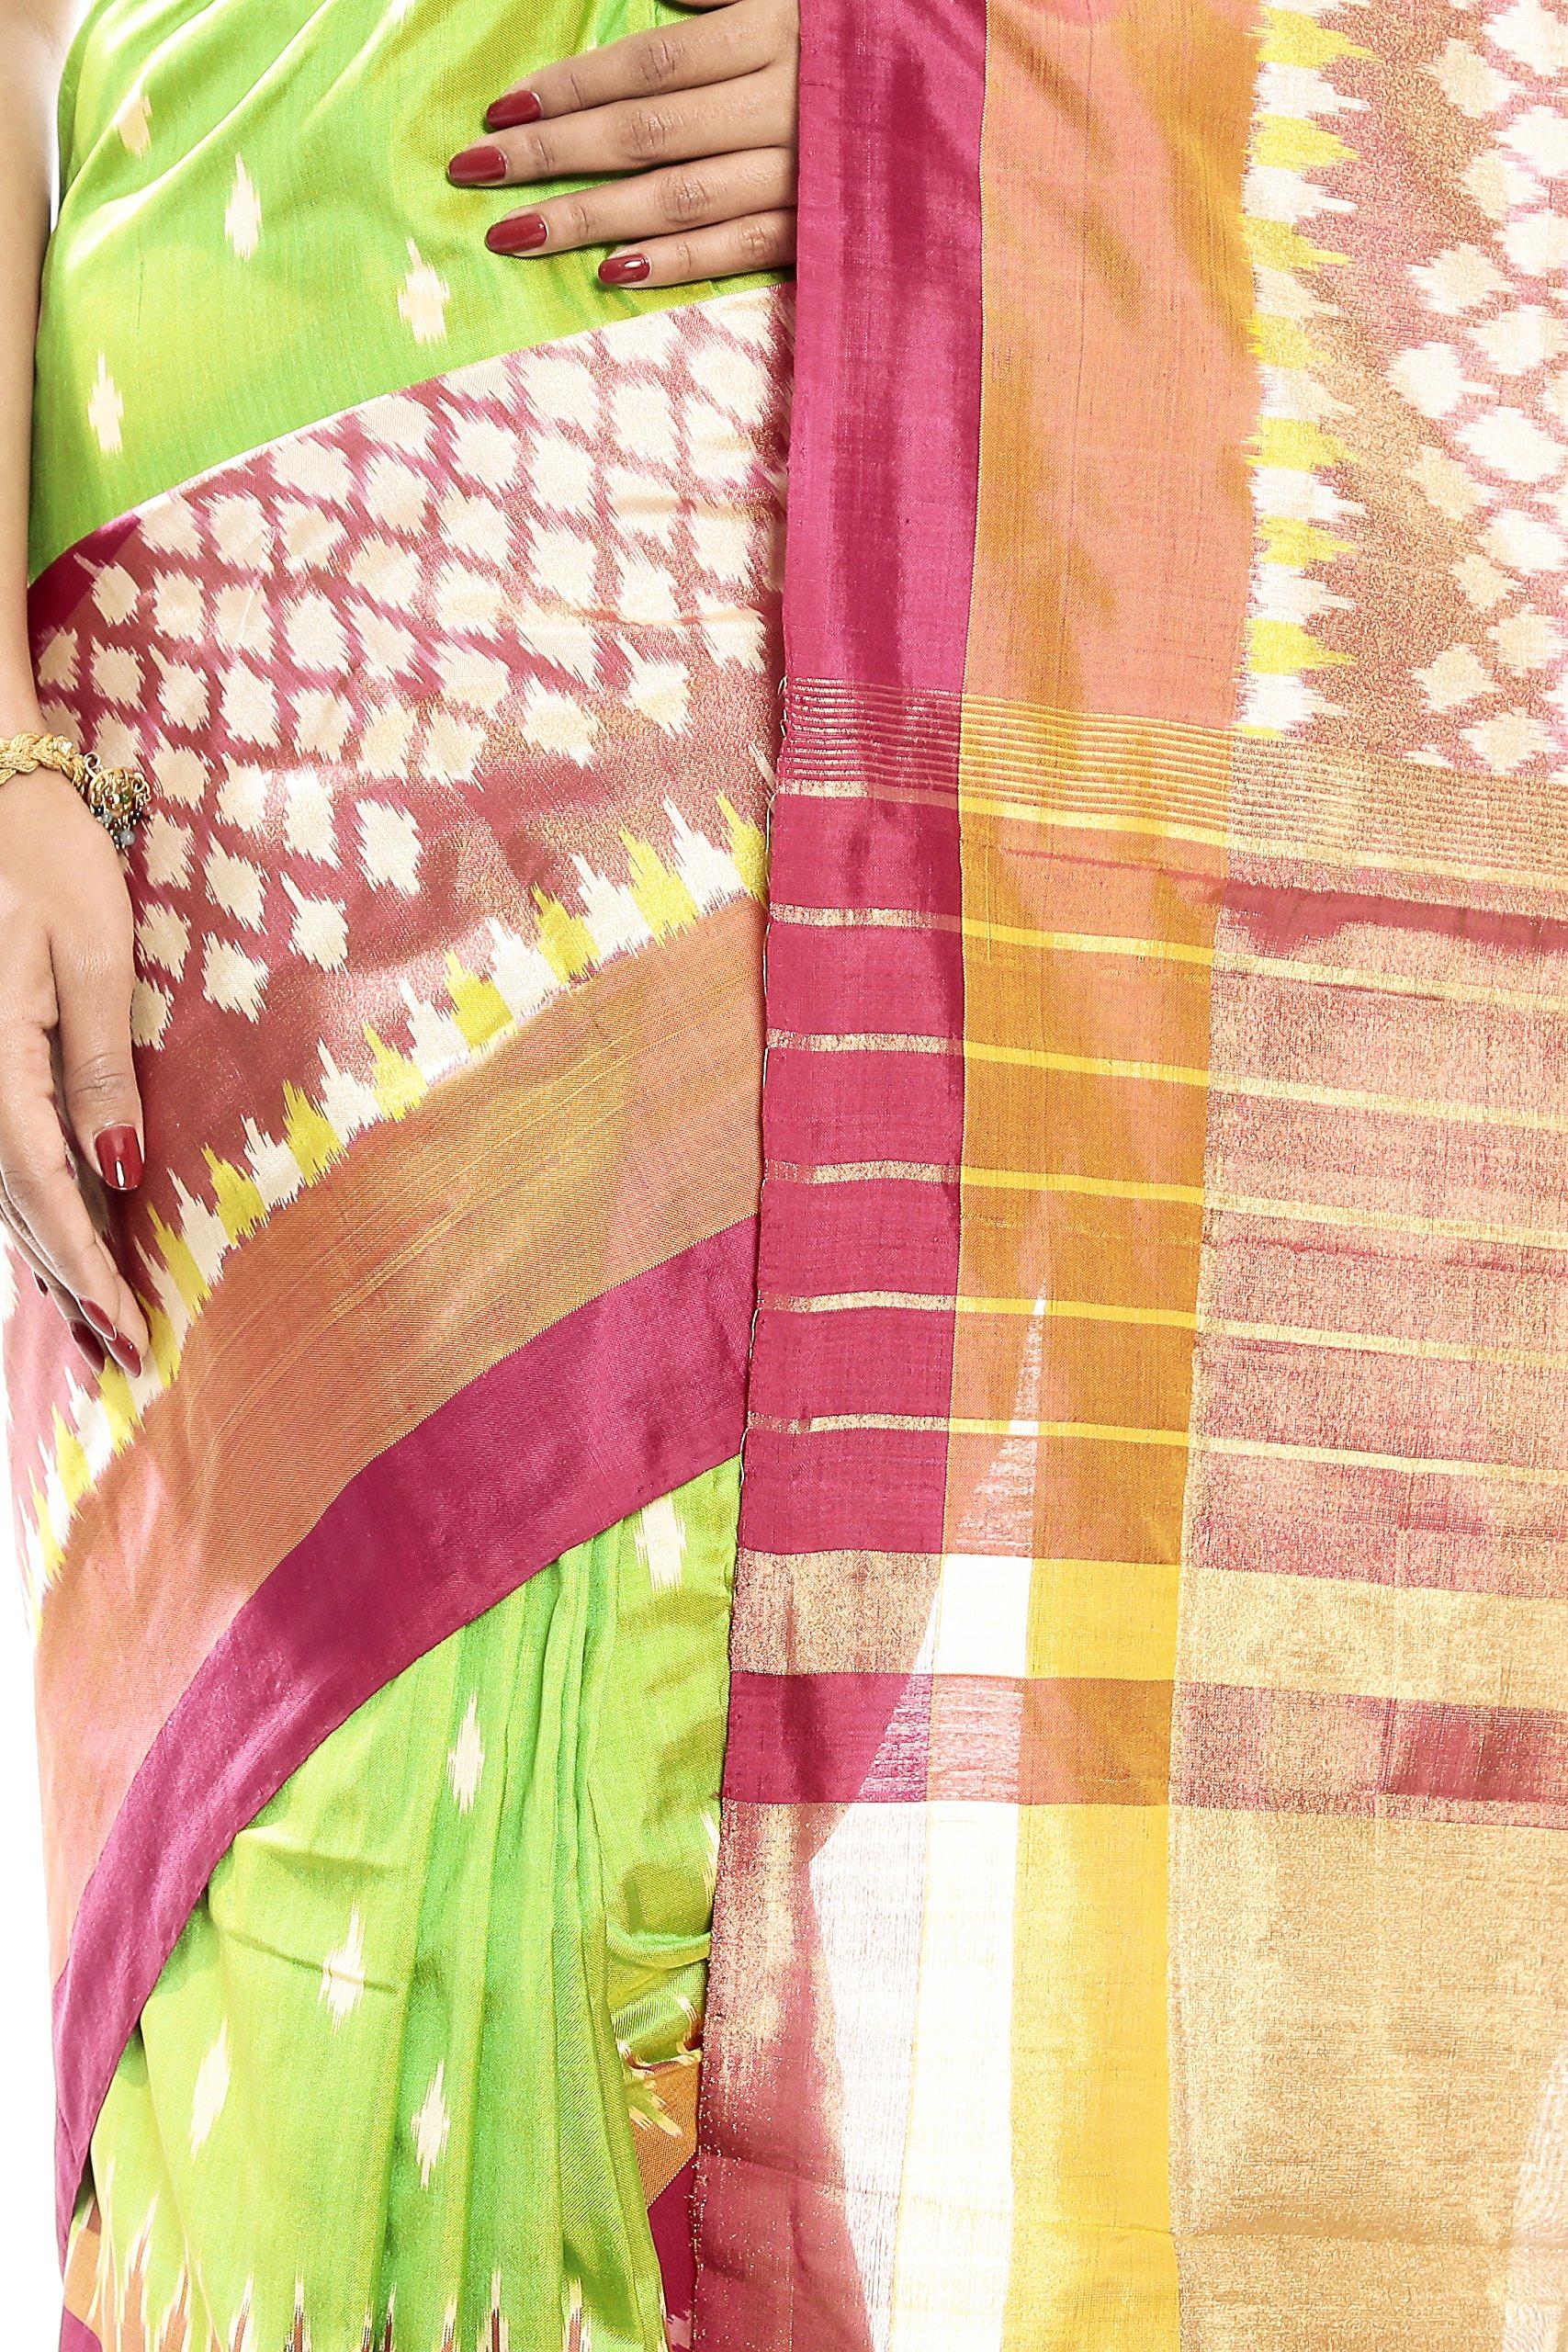 Mandakini — Indian Women's Pochampally - Handloom - Ikat Pure Silk Saree (Pink-Green ) (MK303) by Mandakini (Image #4)